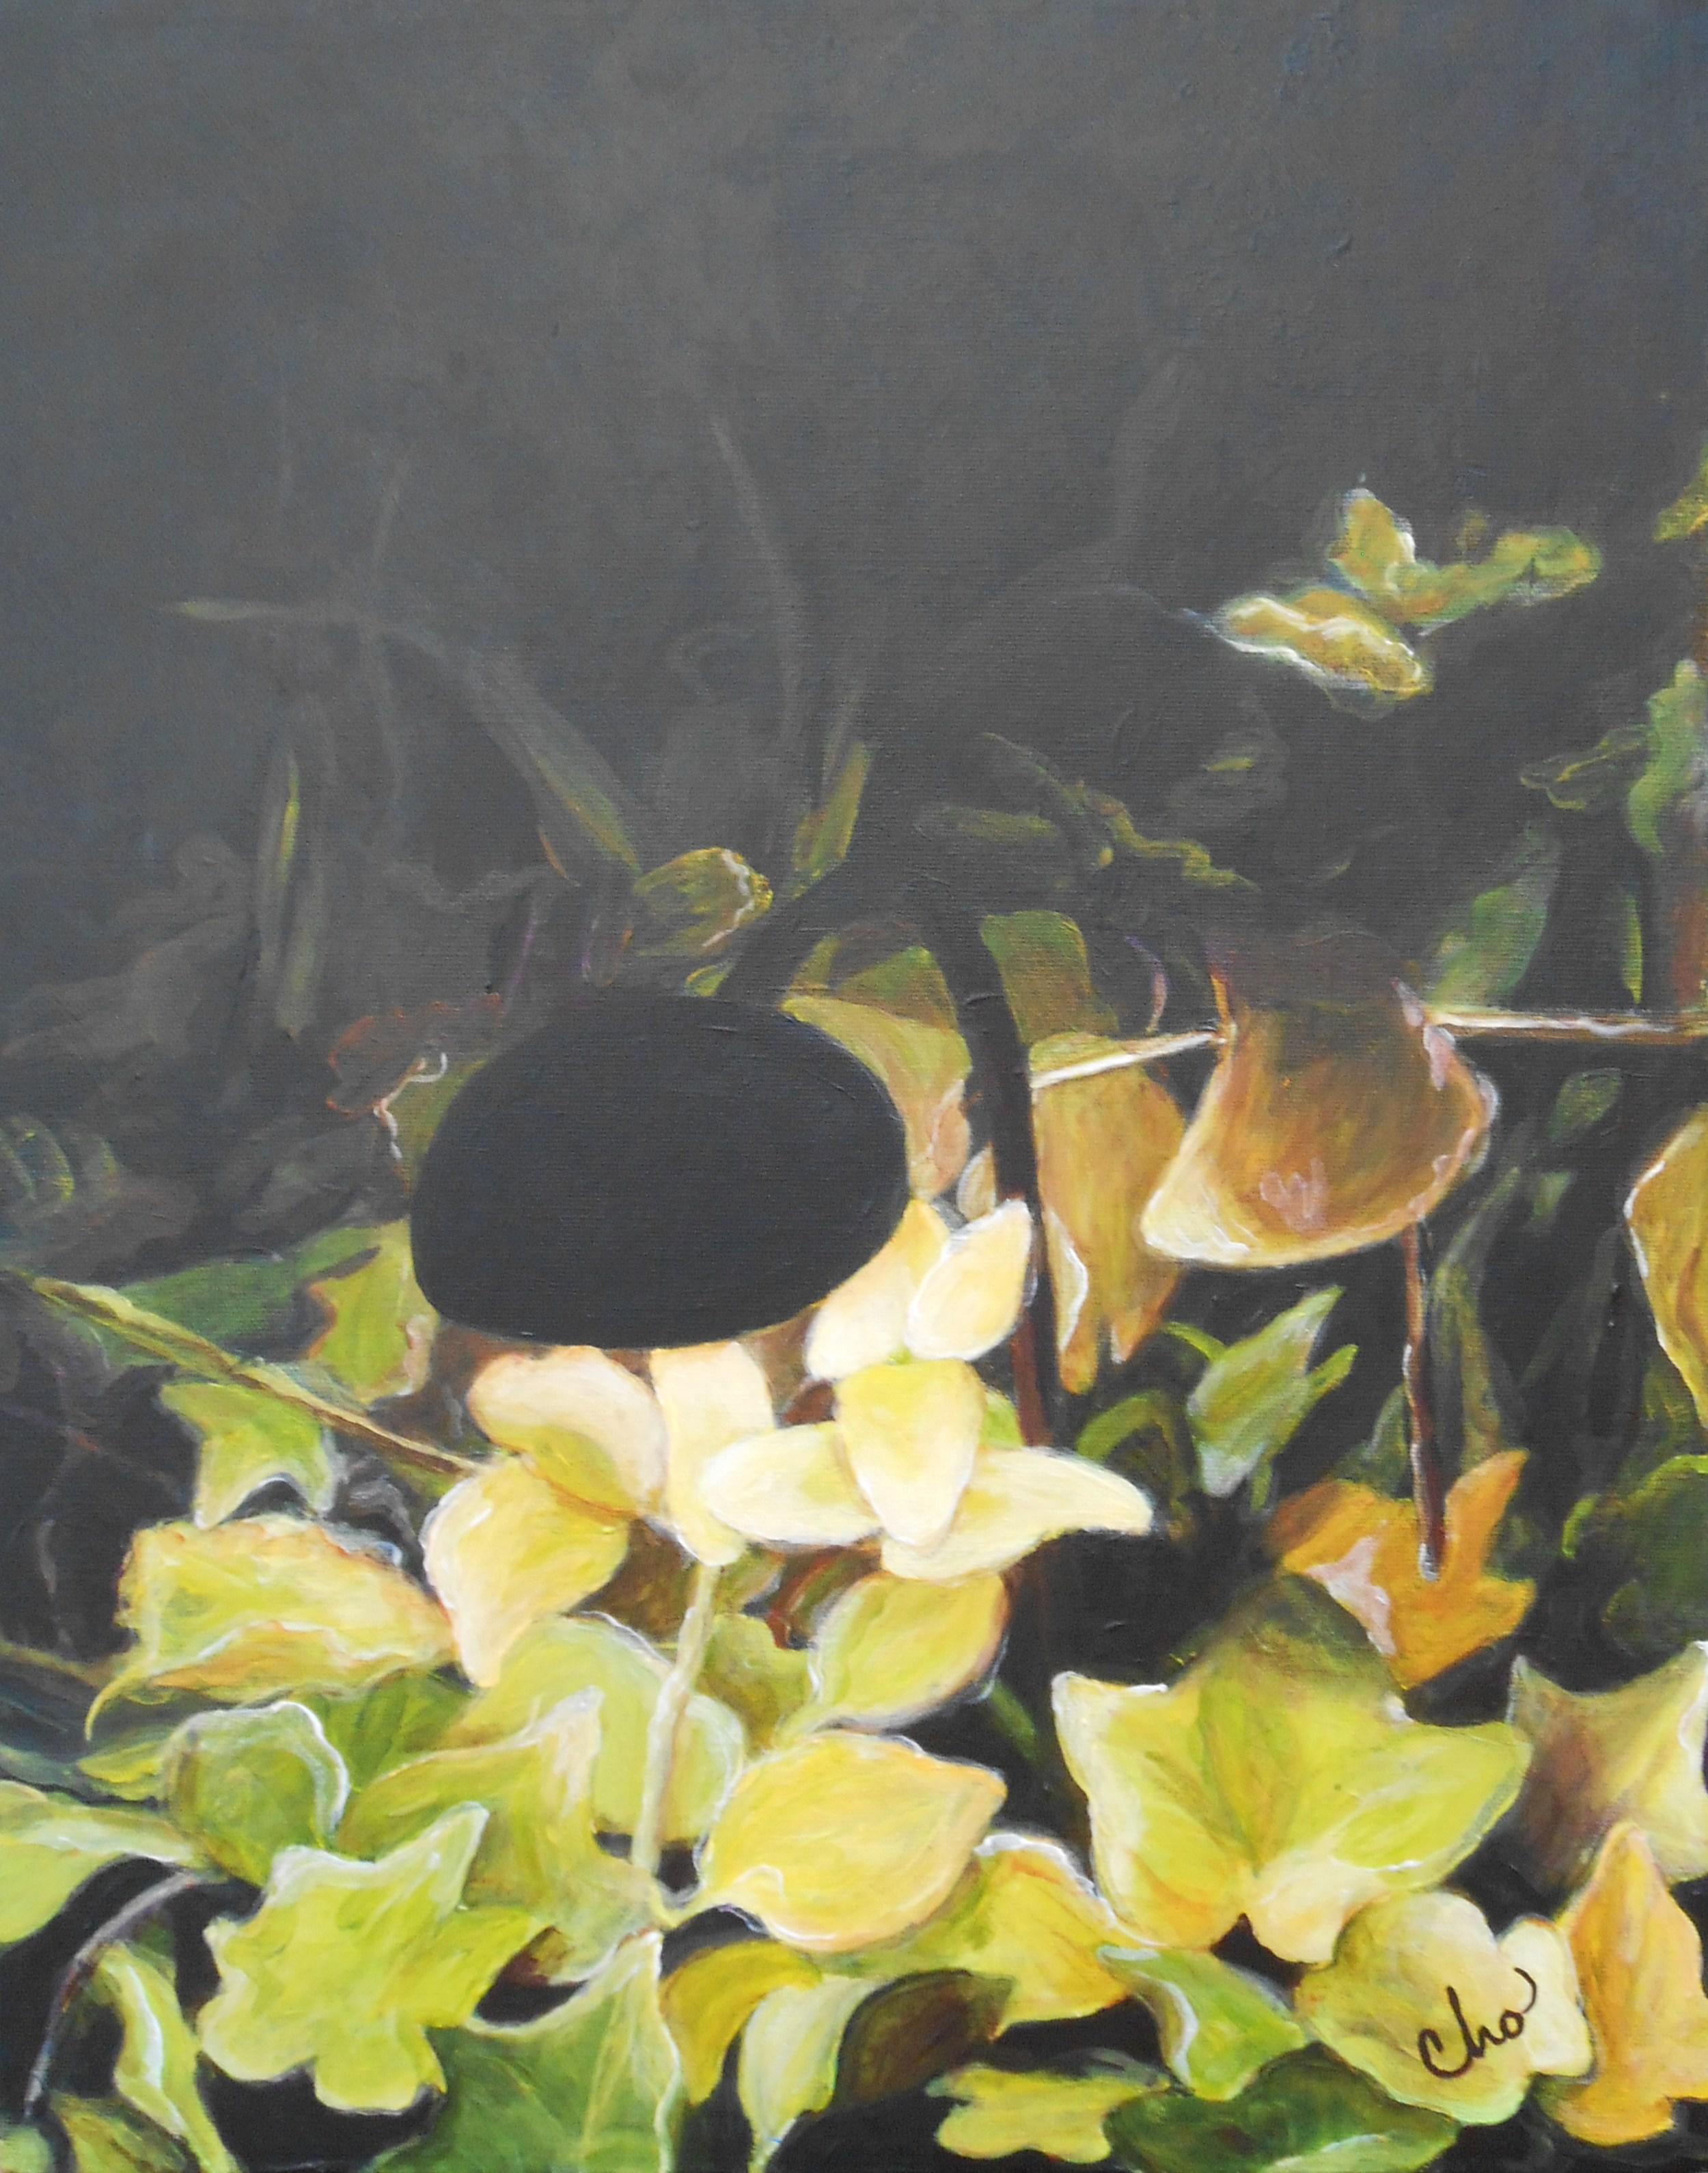 Light in a Dark Garden (No. 2)--April 2012 20x16-- $150